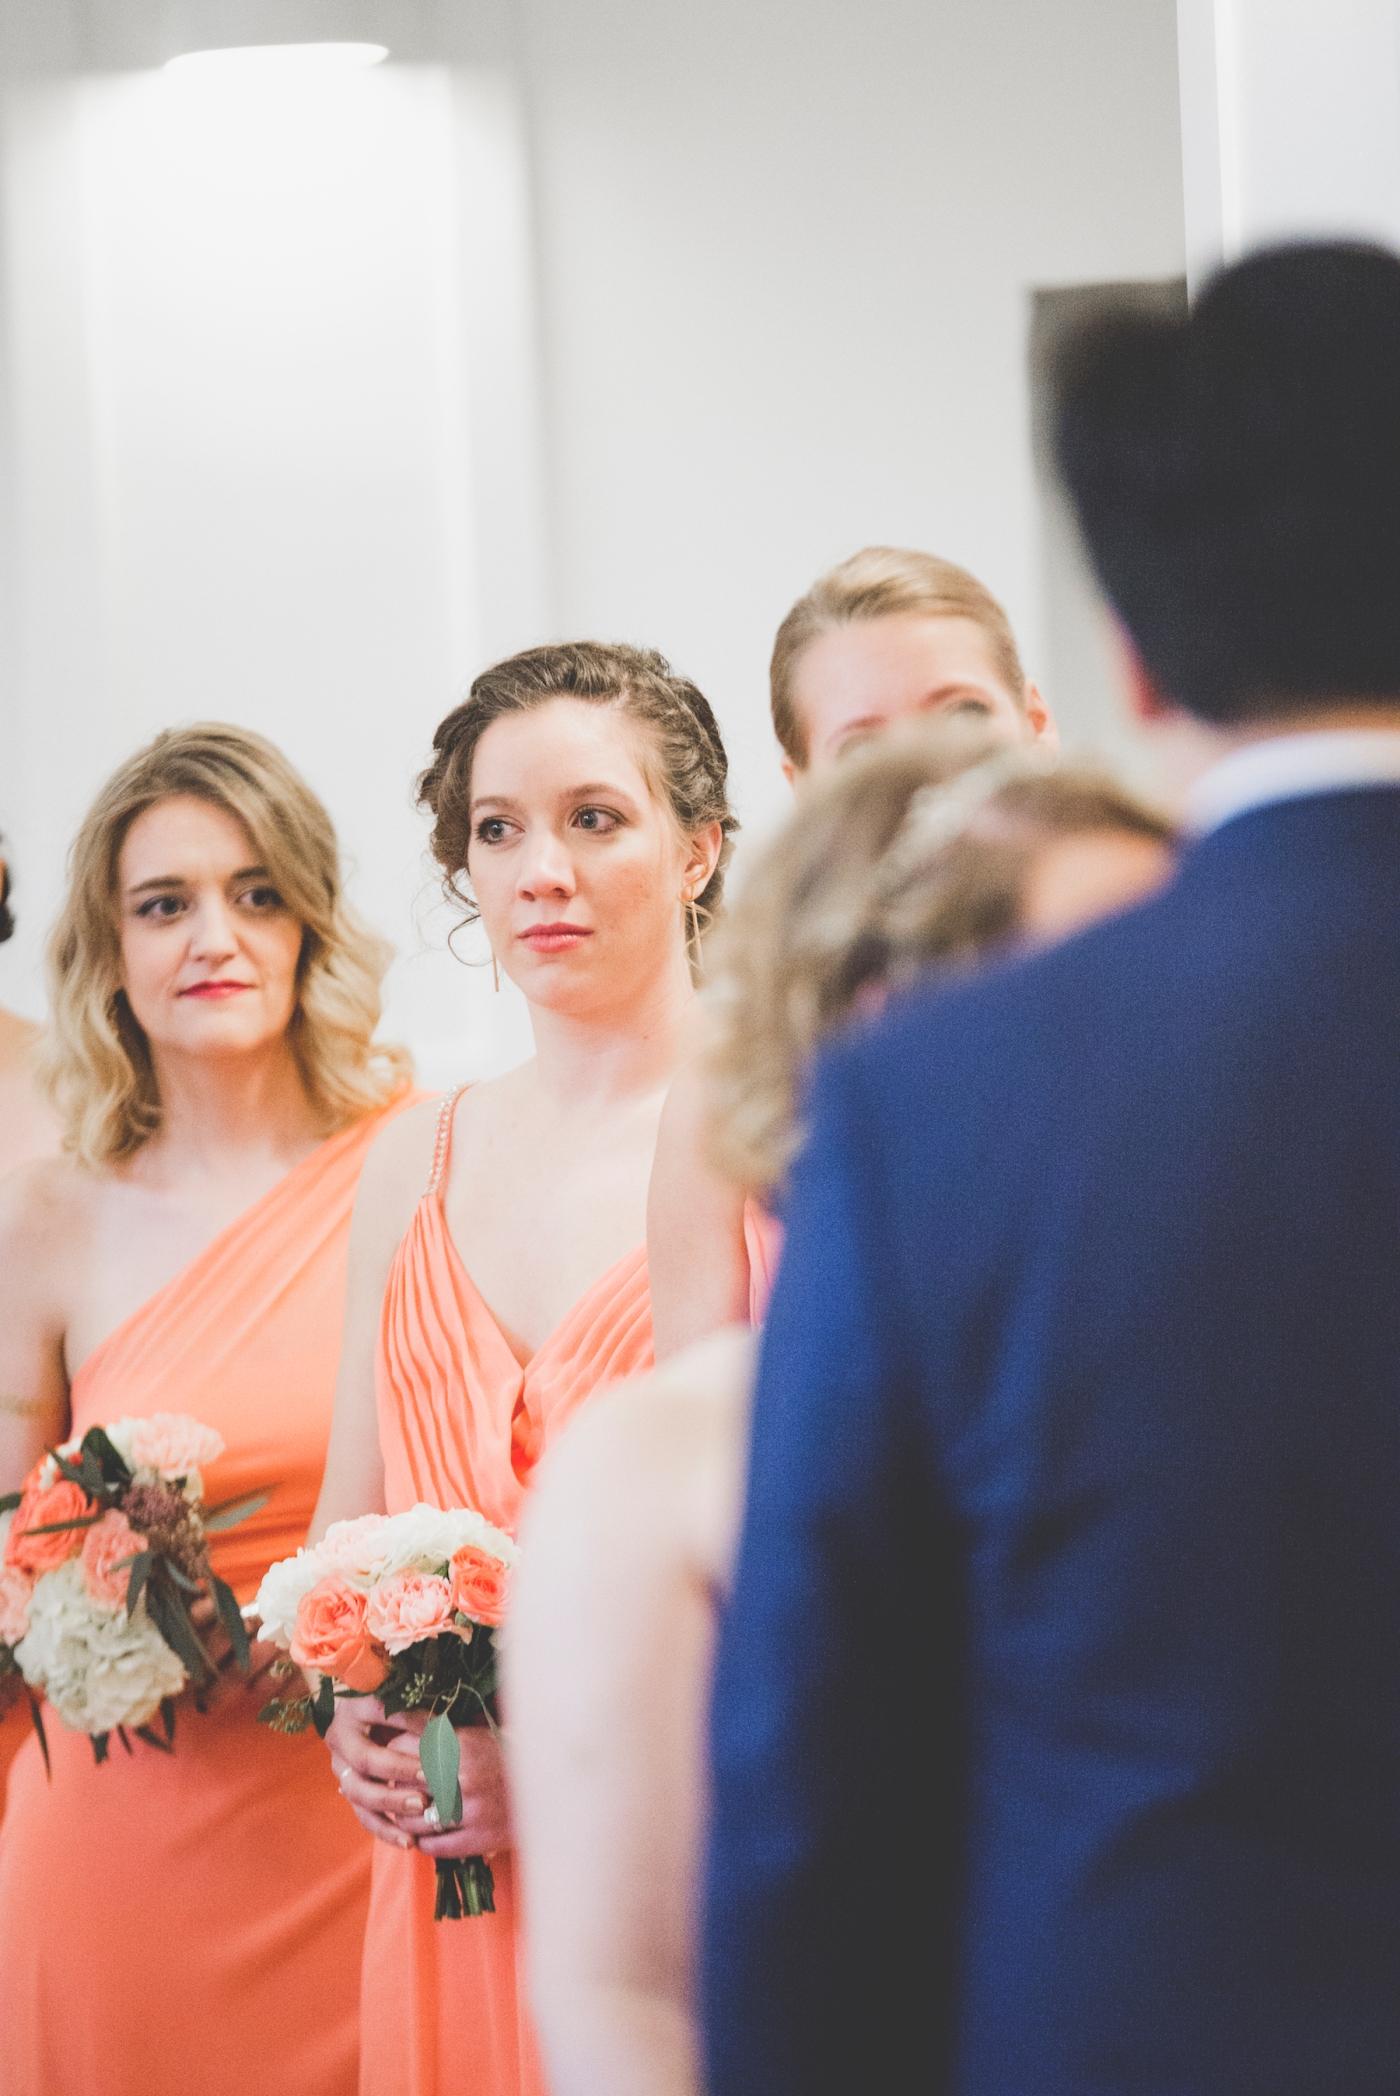 DSC_2629Everett_Wedding_Ballroom_Jane_Speleers_photography_Rachel_and_Edmund_Ceremony_2017